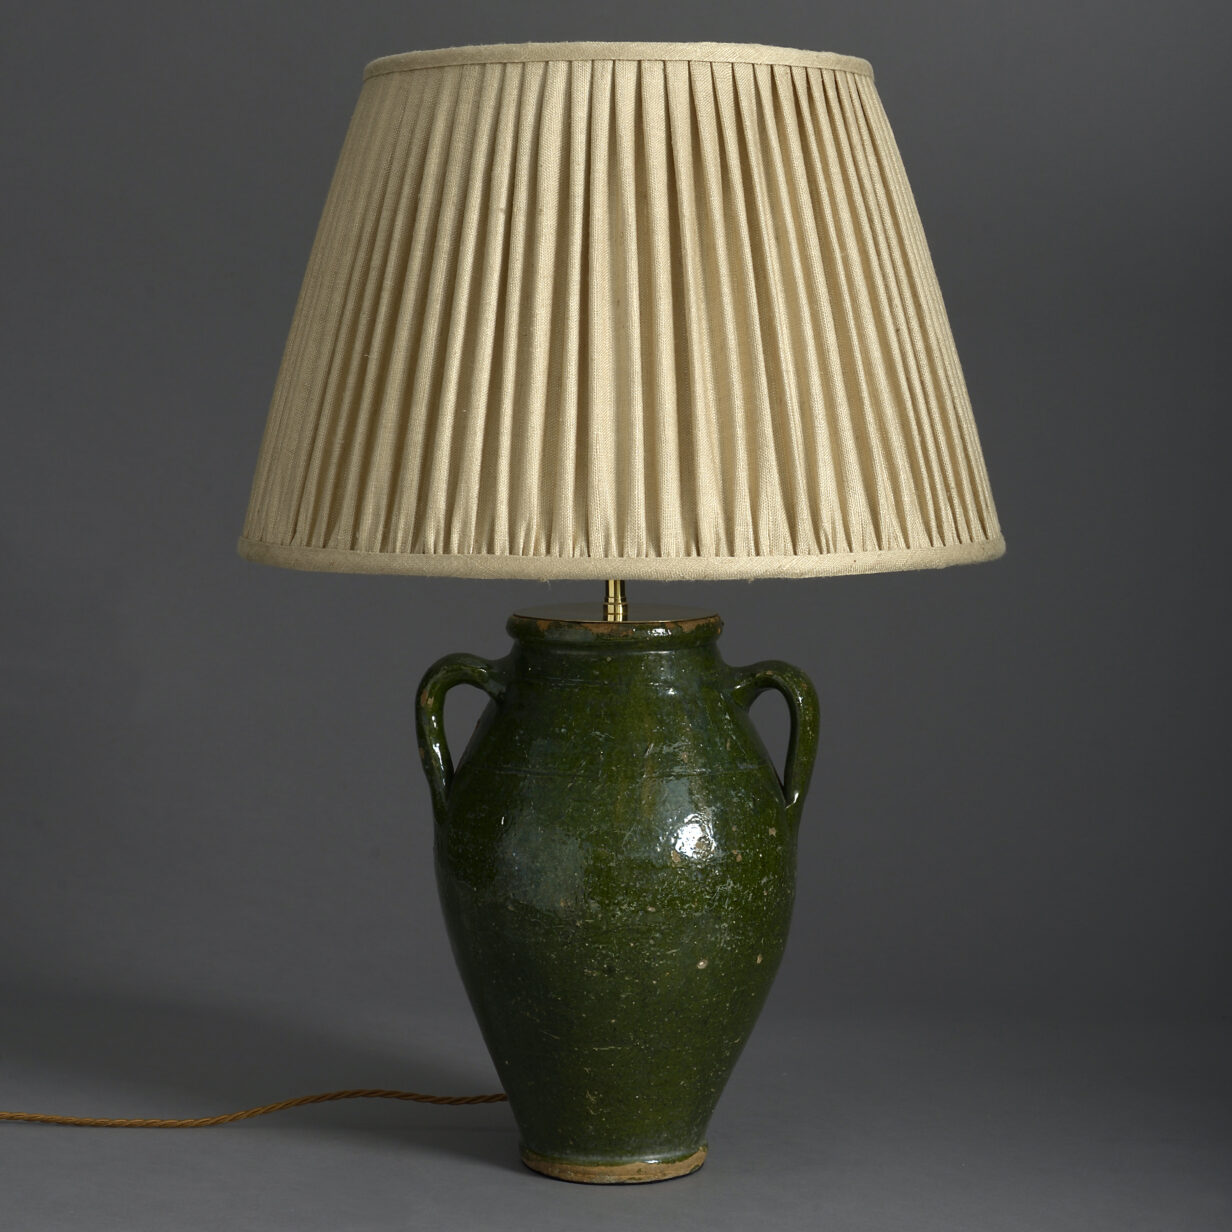 Green Glazed Pottery Vase Lamp